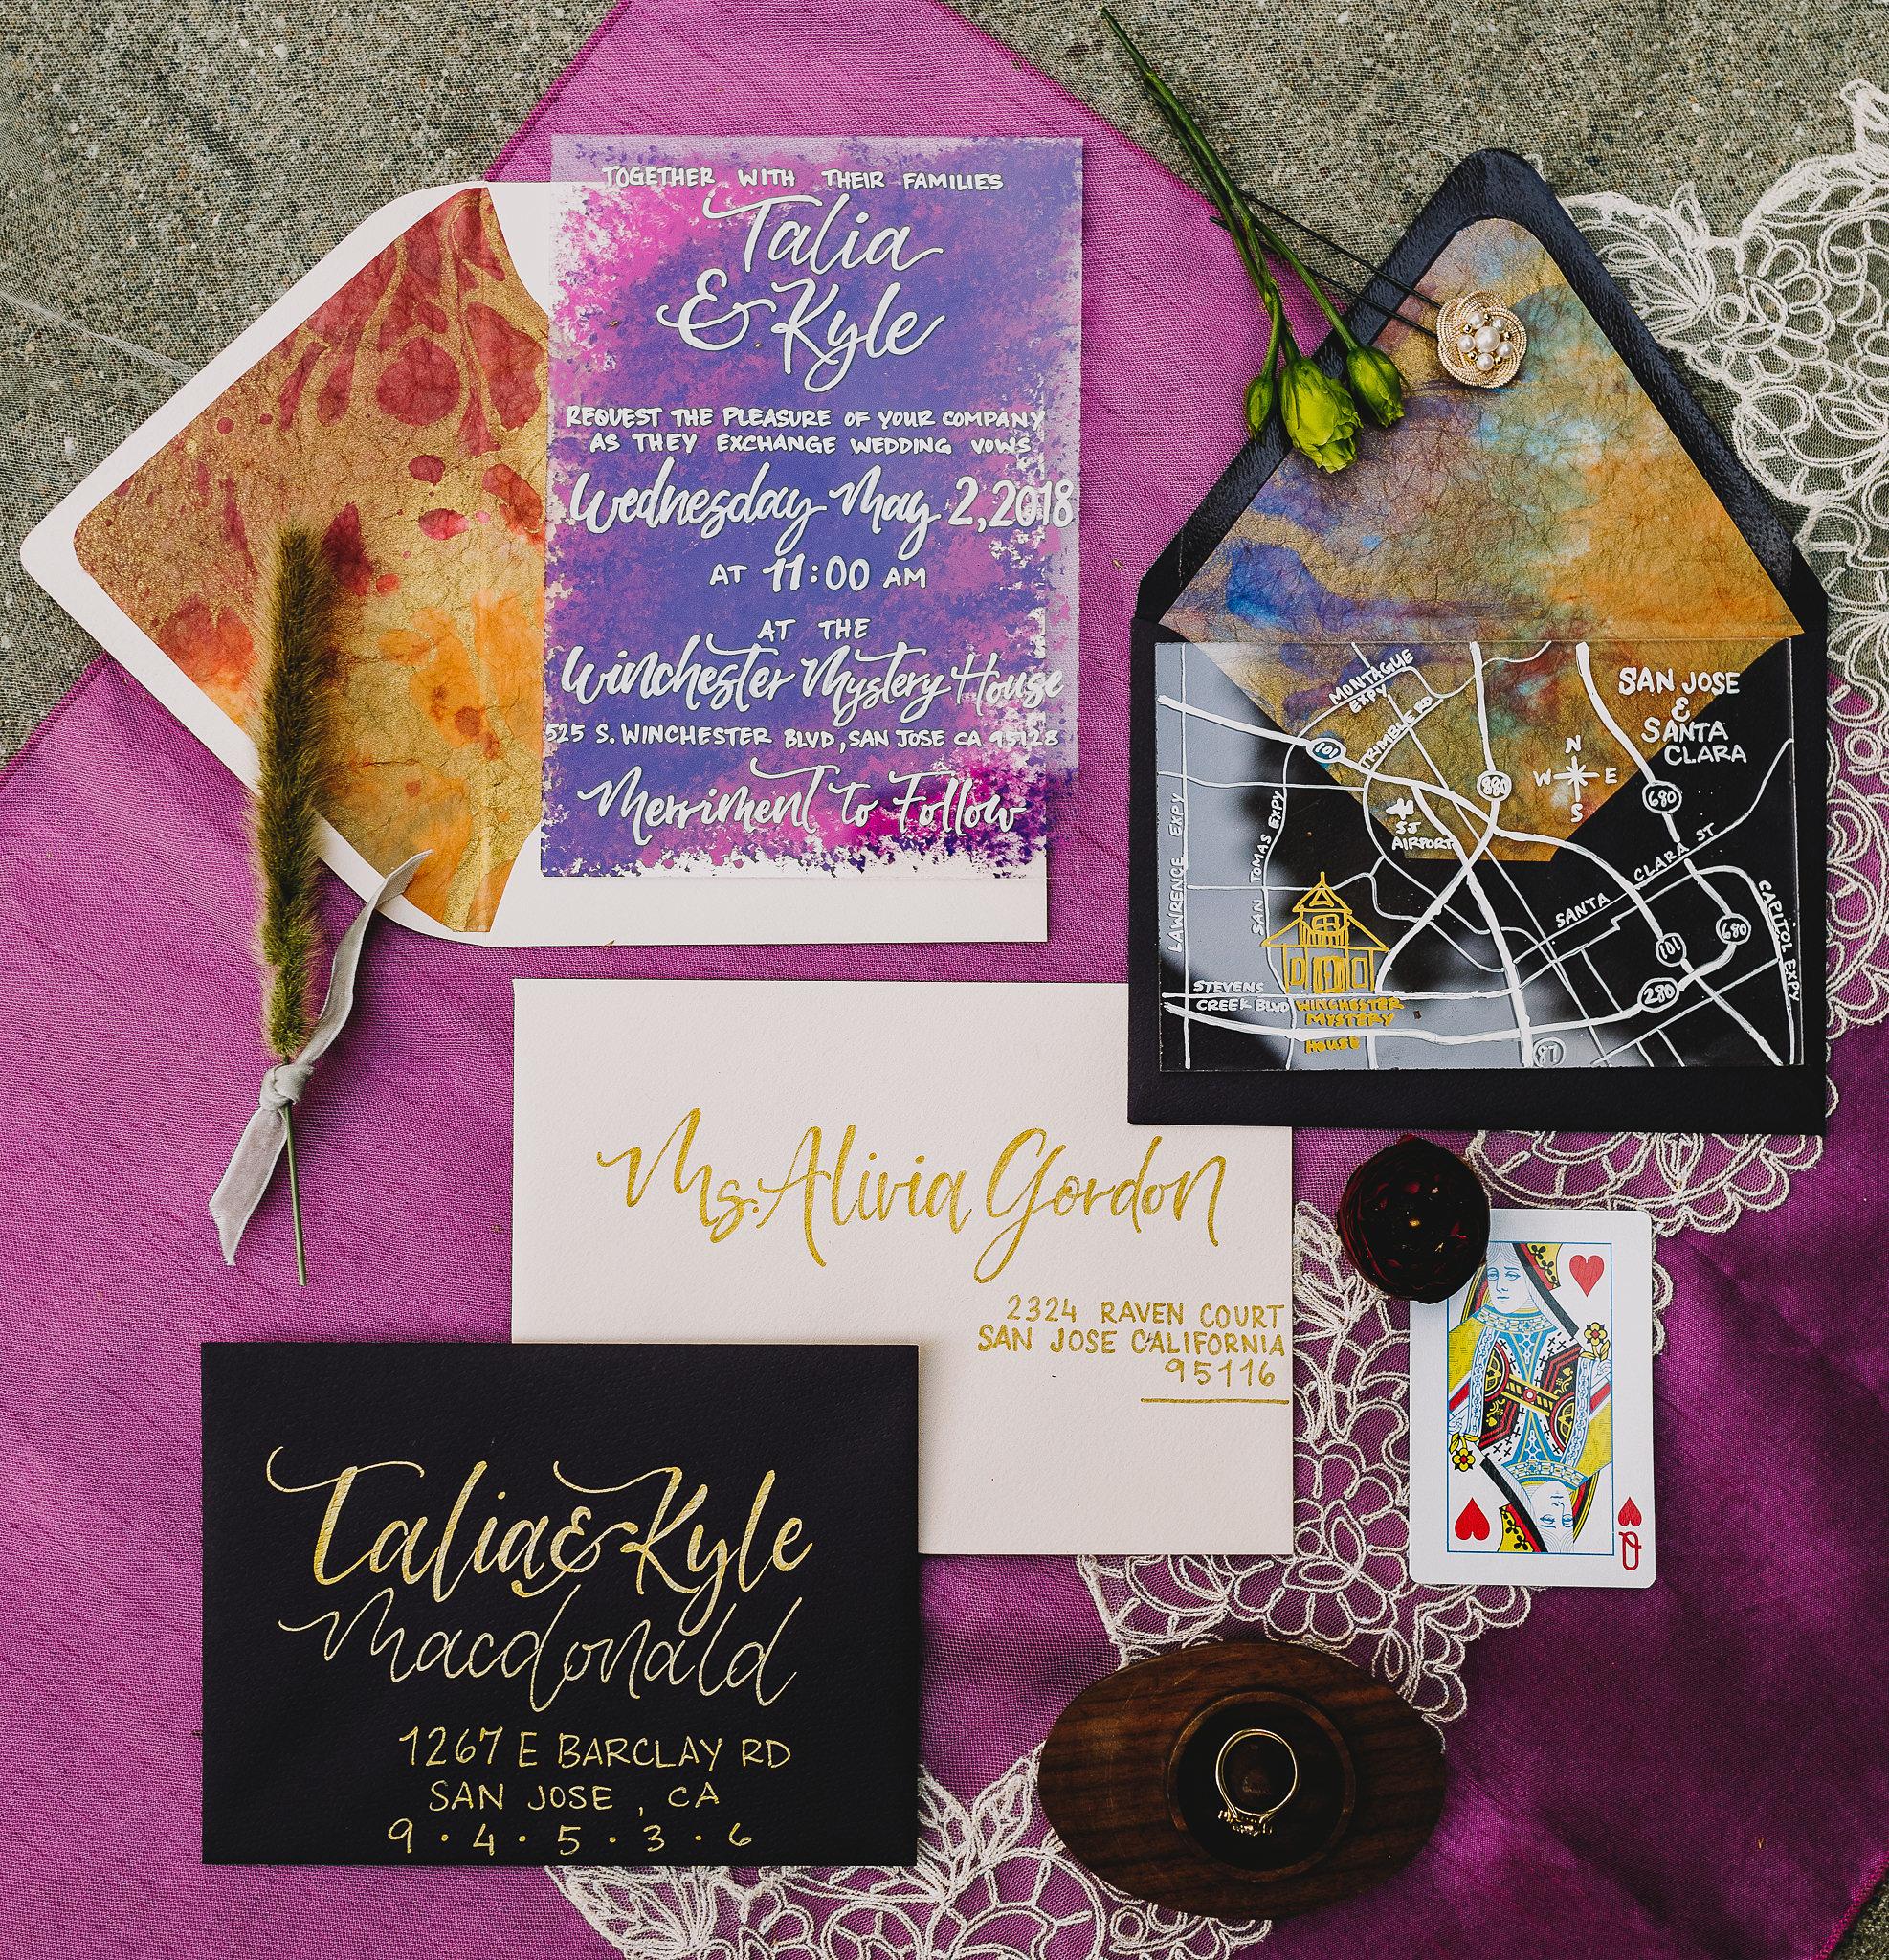 kim baker beauty luxury lifestyle and bridal makeup artist san jose bay area california hailey williams archer inspired